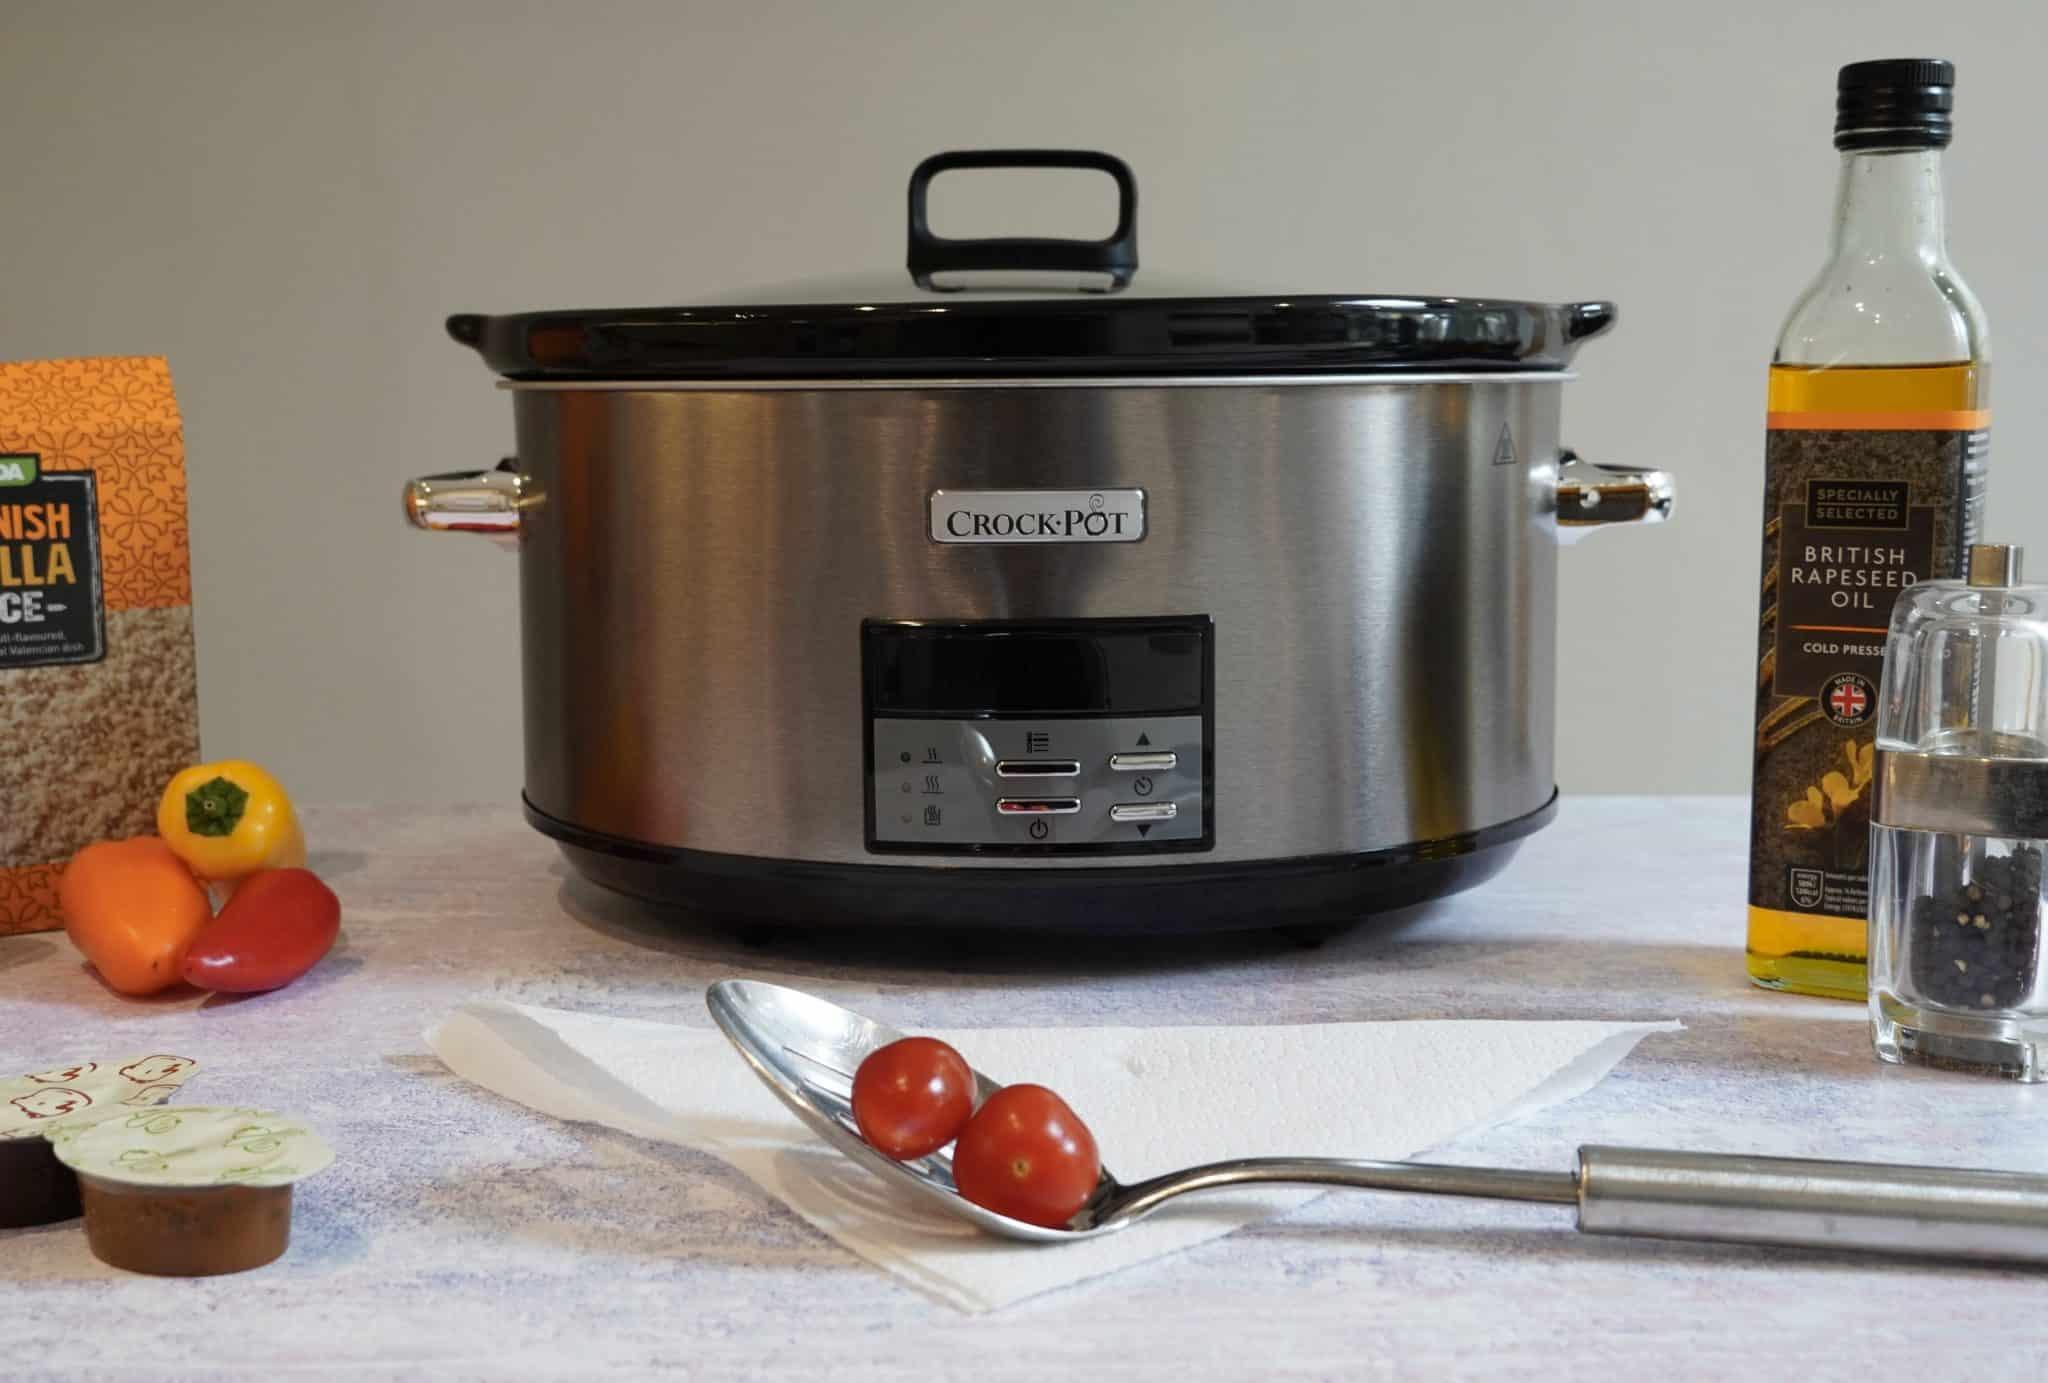 Can You Put A Crockpot In A Dishwasher?